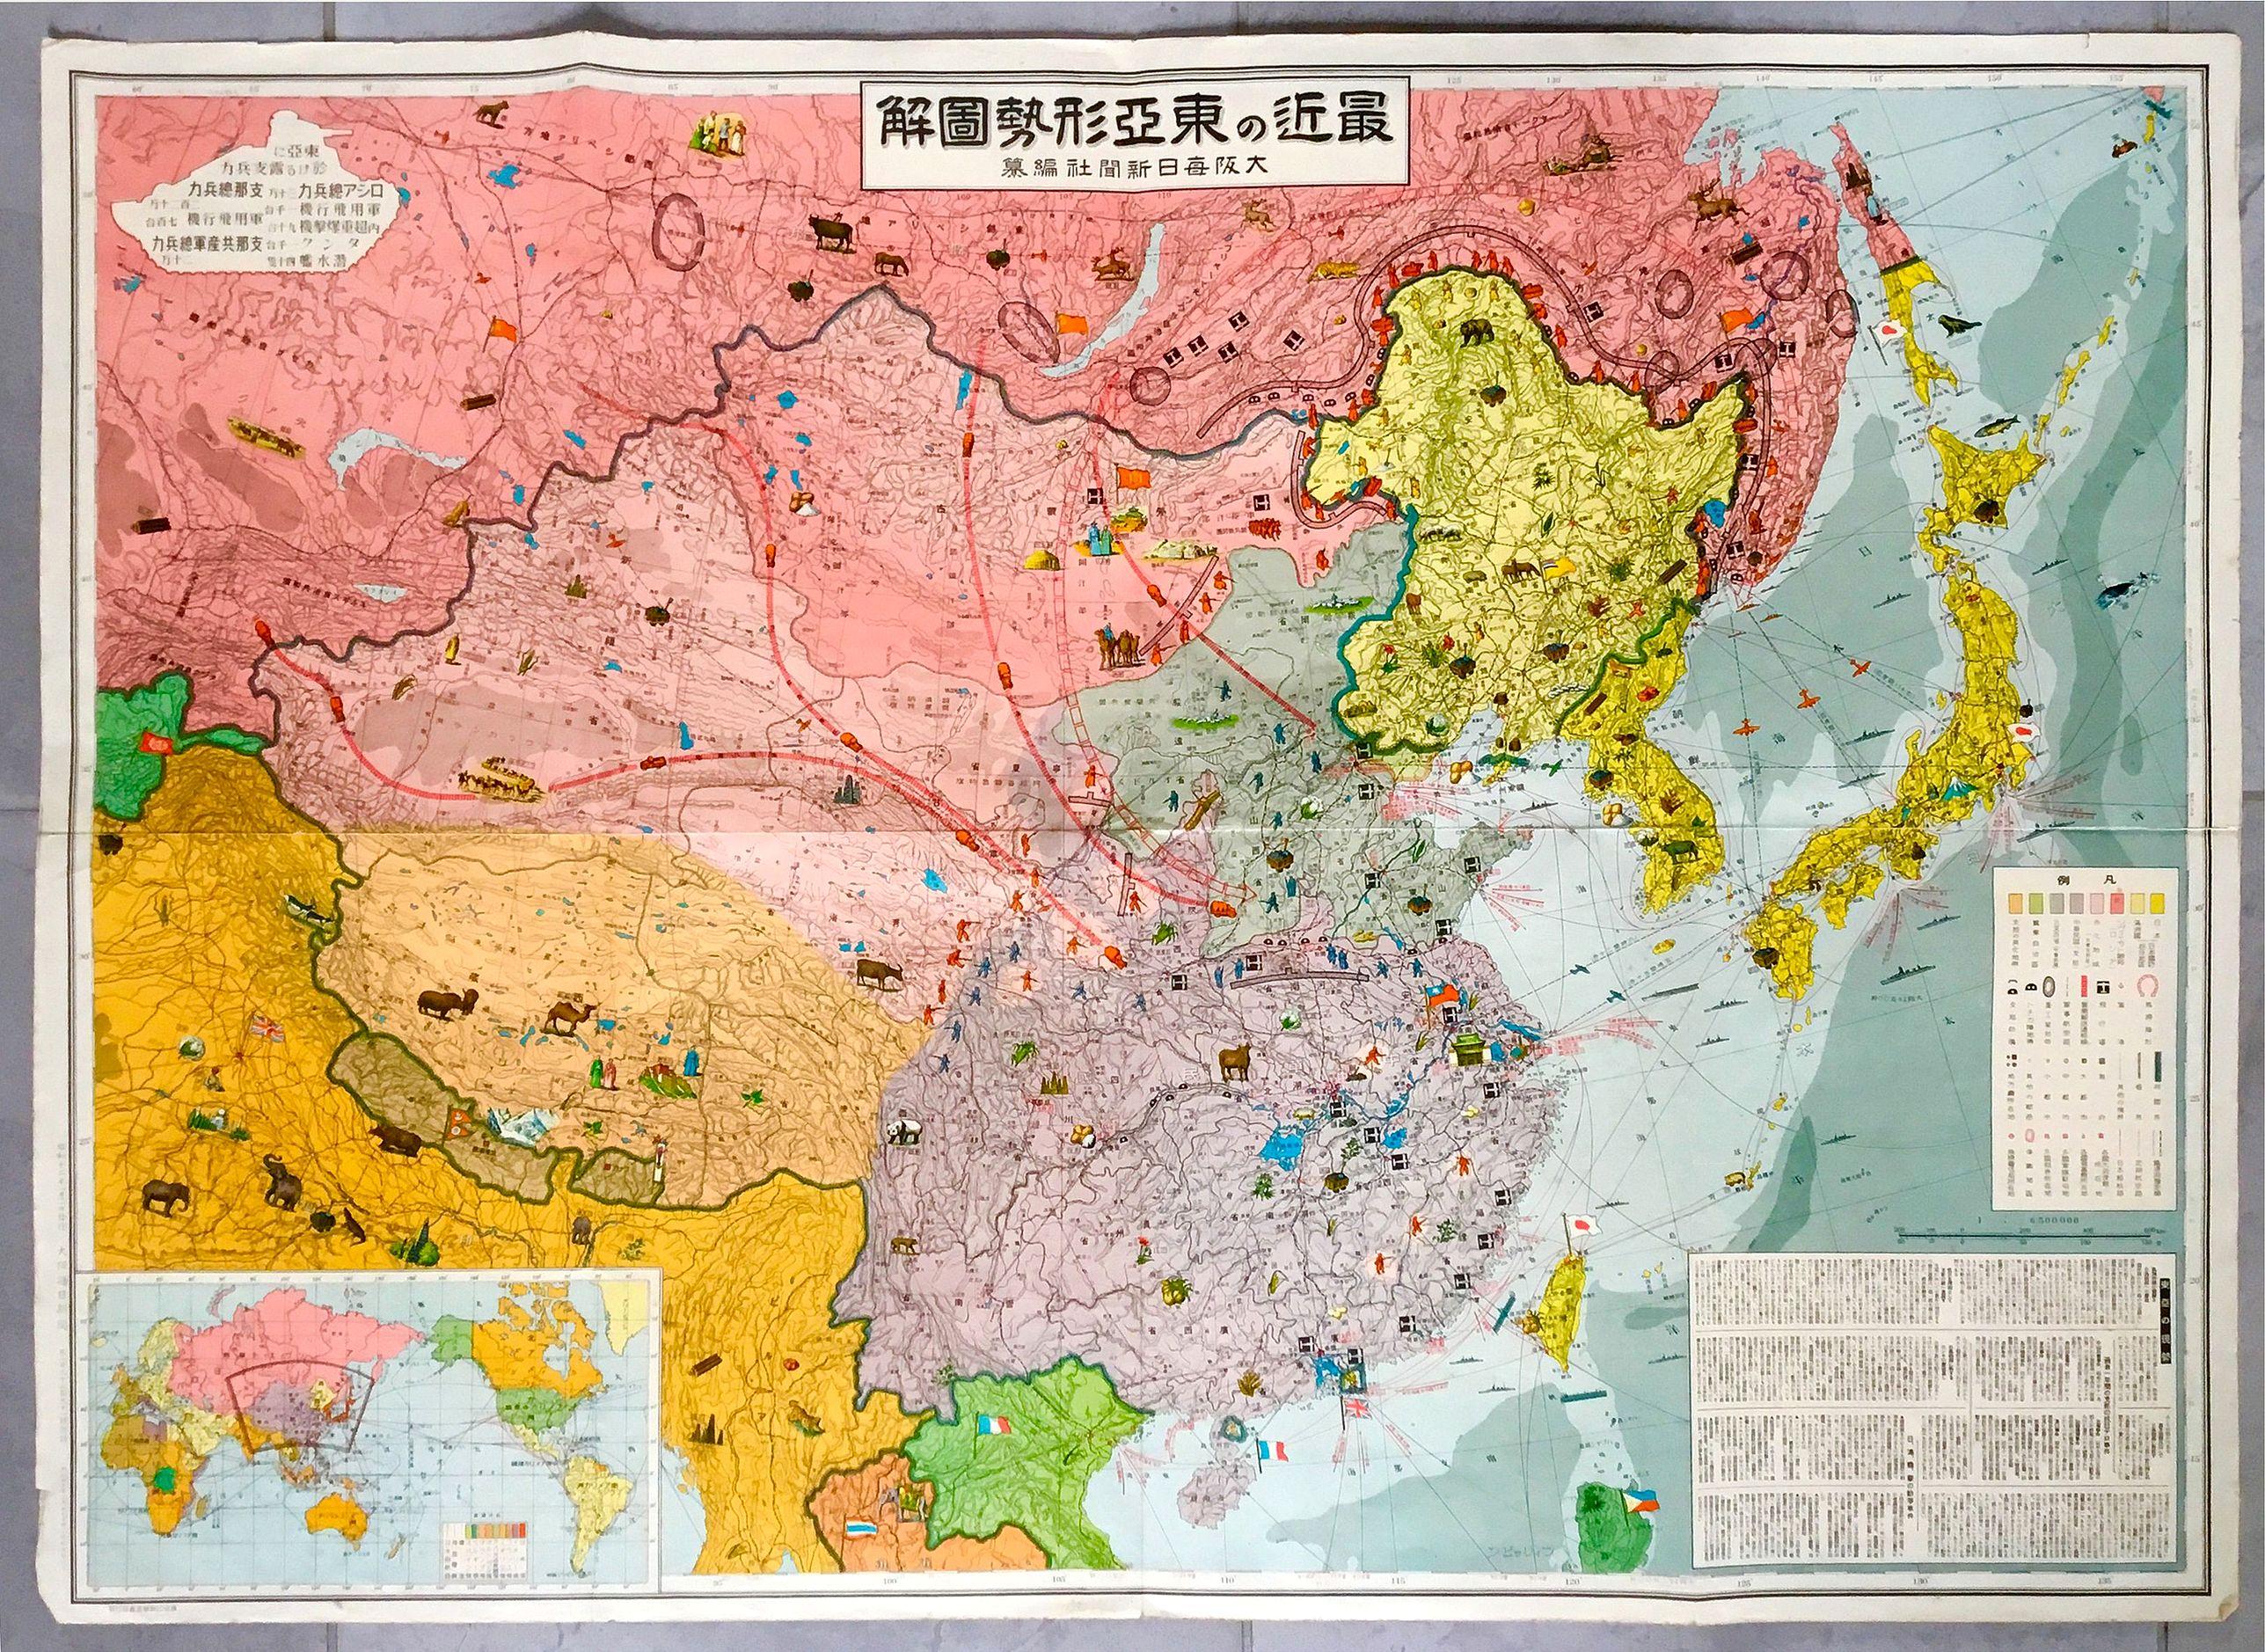 OSAKA MAINICHI SHIMBUN - Illustrated Explanation of Recent East Asia Situation.